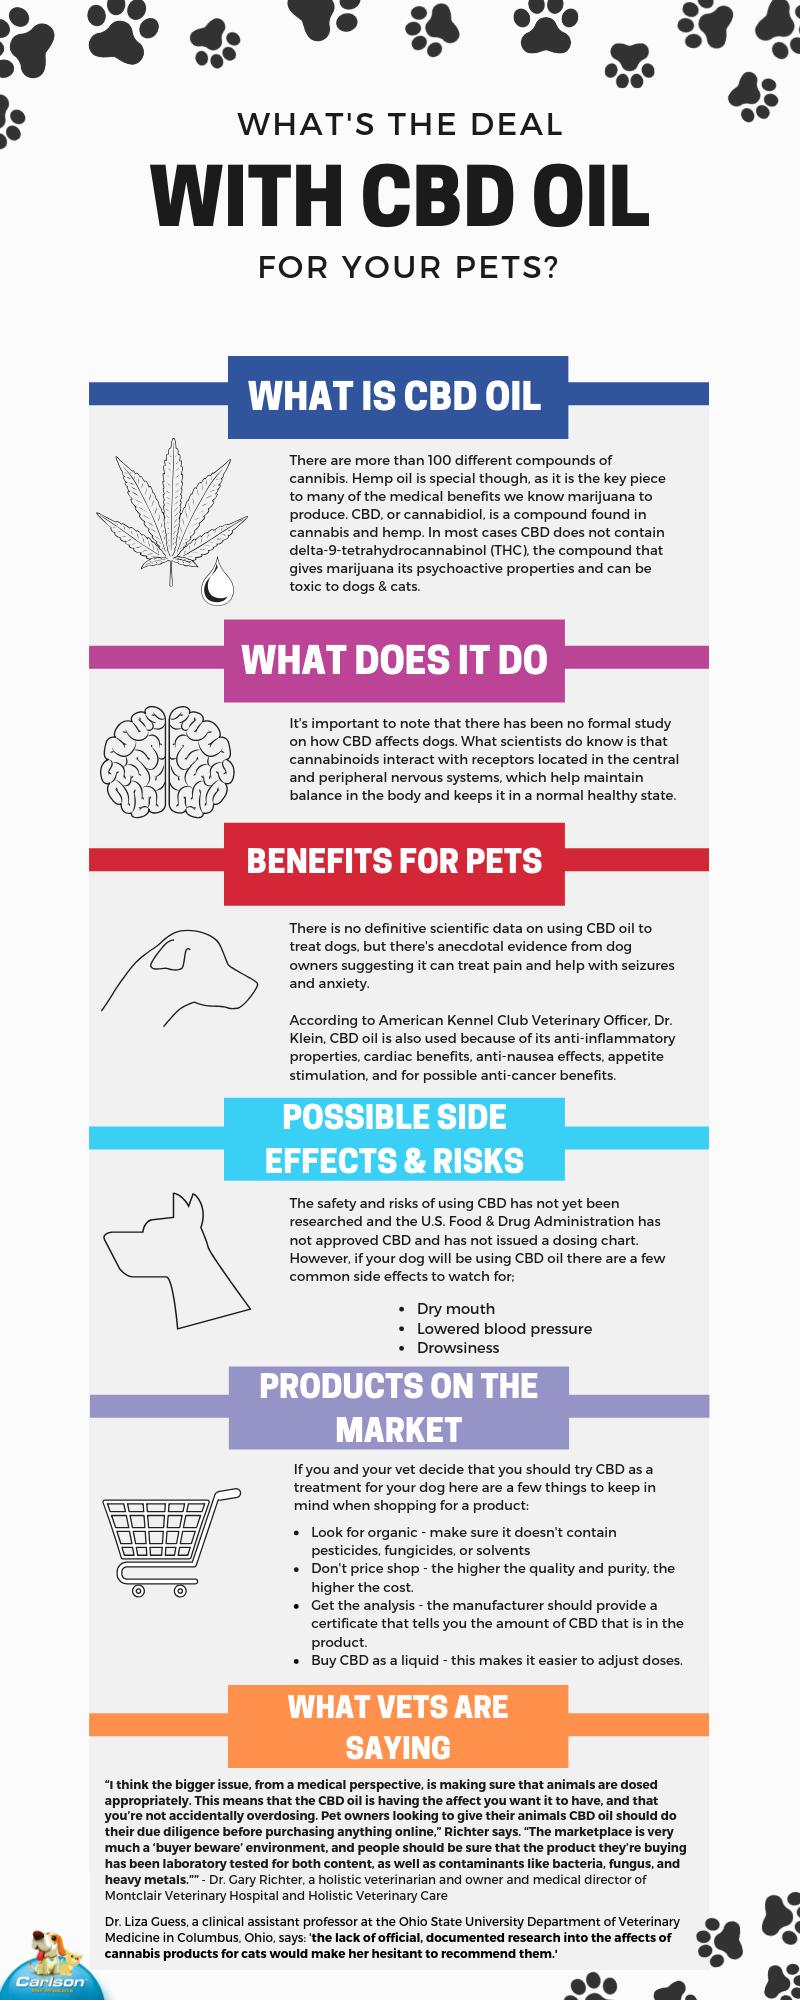 CBD oil for pets info graphic